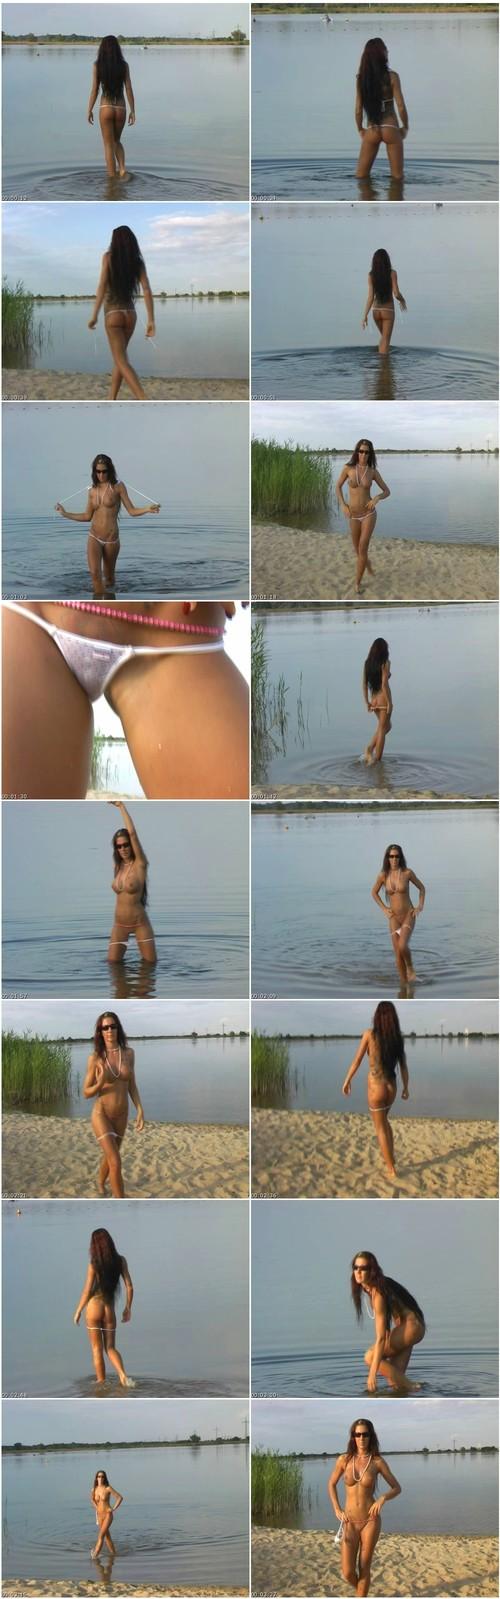 [Image: Bikini170_thumb_m.jpg]